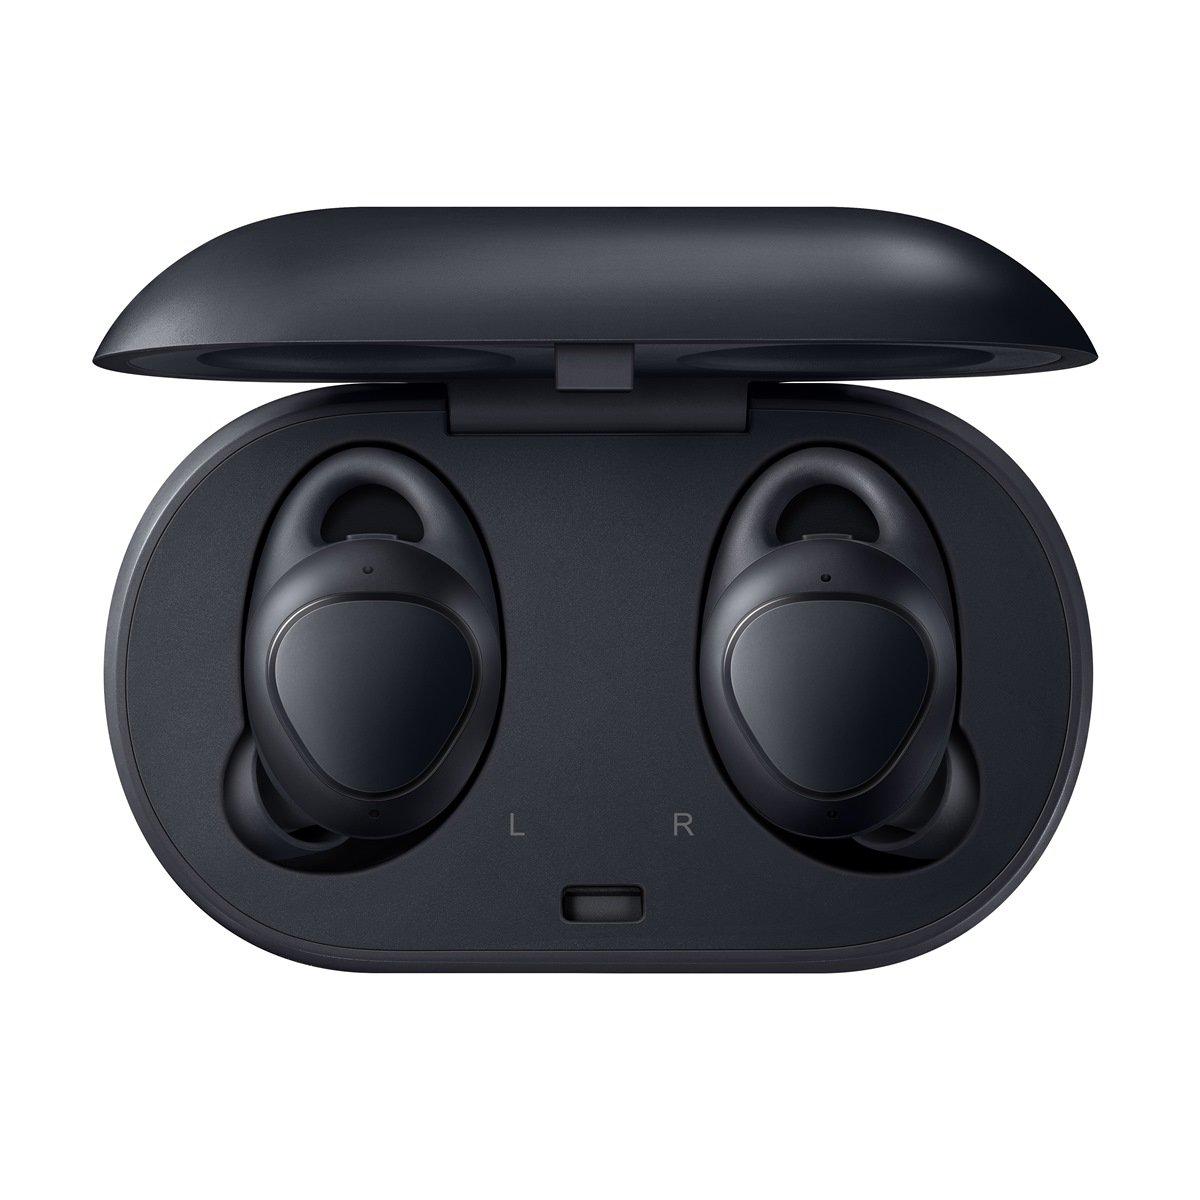 Audífonos Gear Iconx Negro (2018)